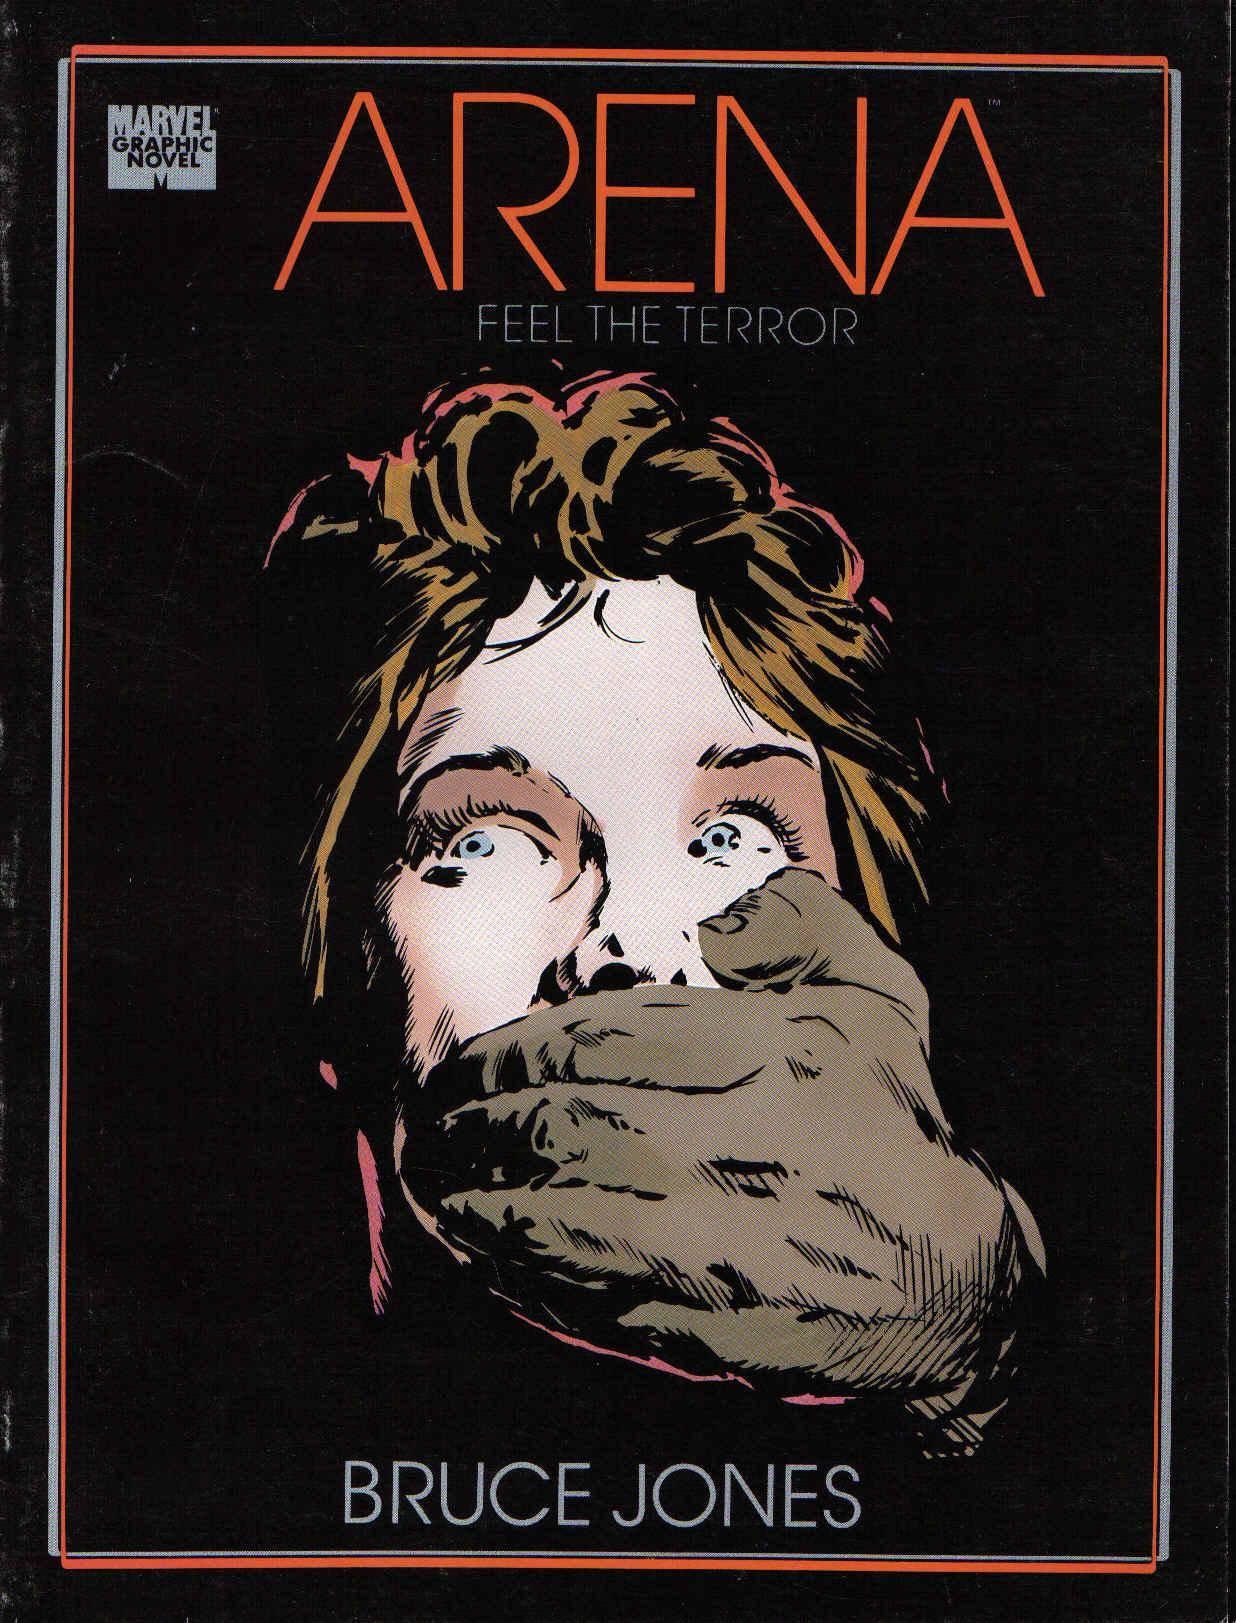 Marvel Graphic Novel 45 - Arena 1989